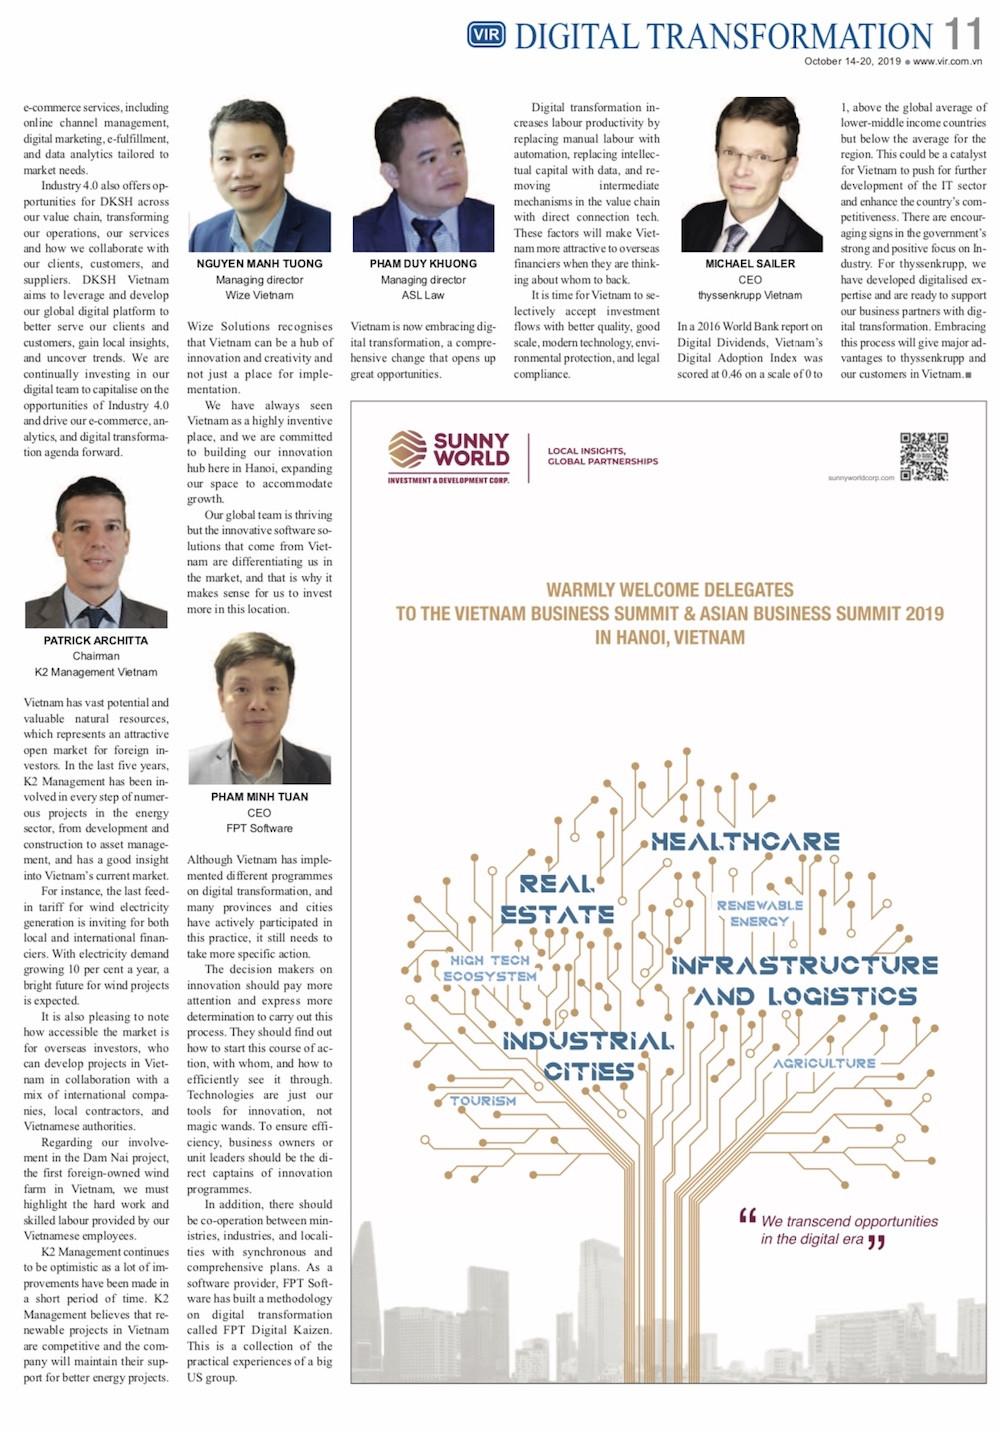 Vietnam Summit 2019: Swift digital revolution drives Vietnam's economic growth